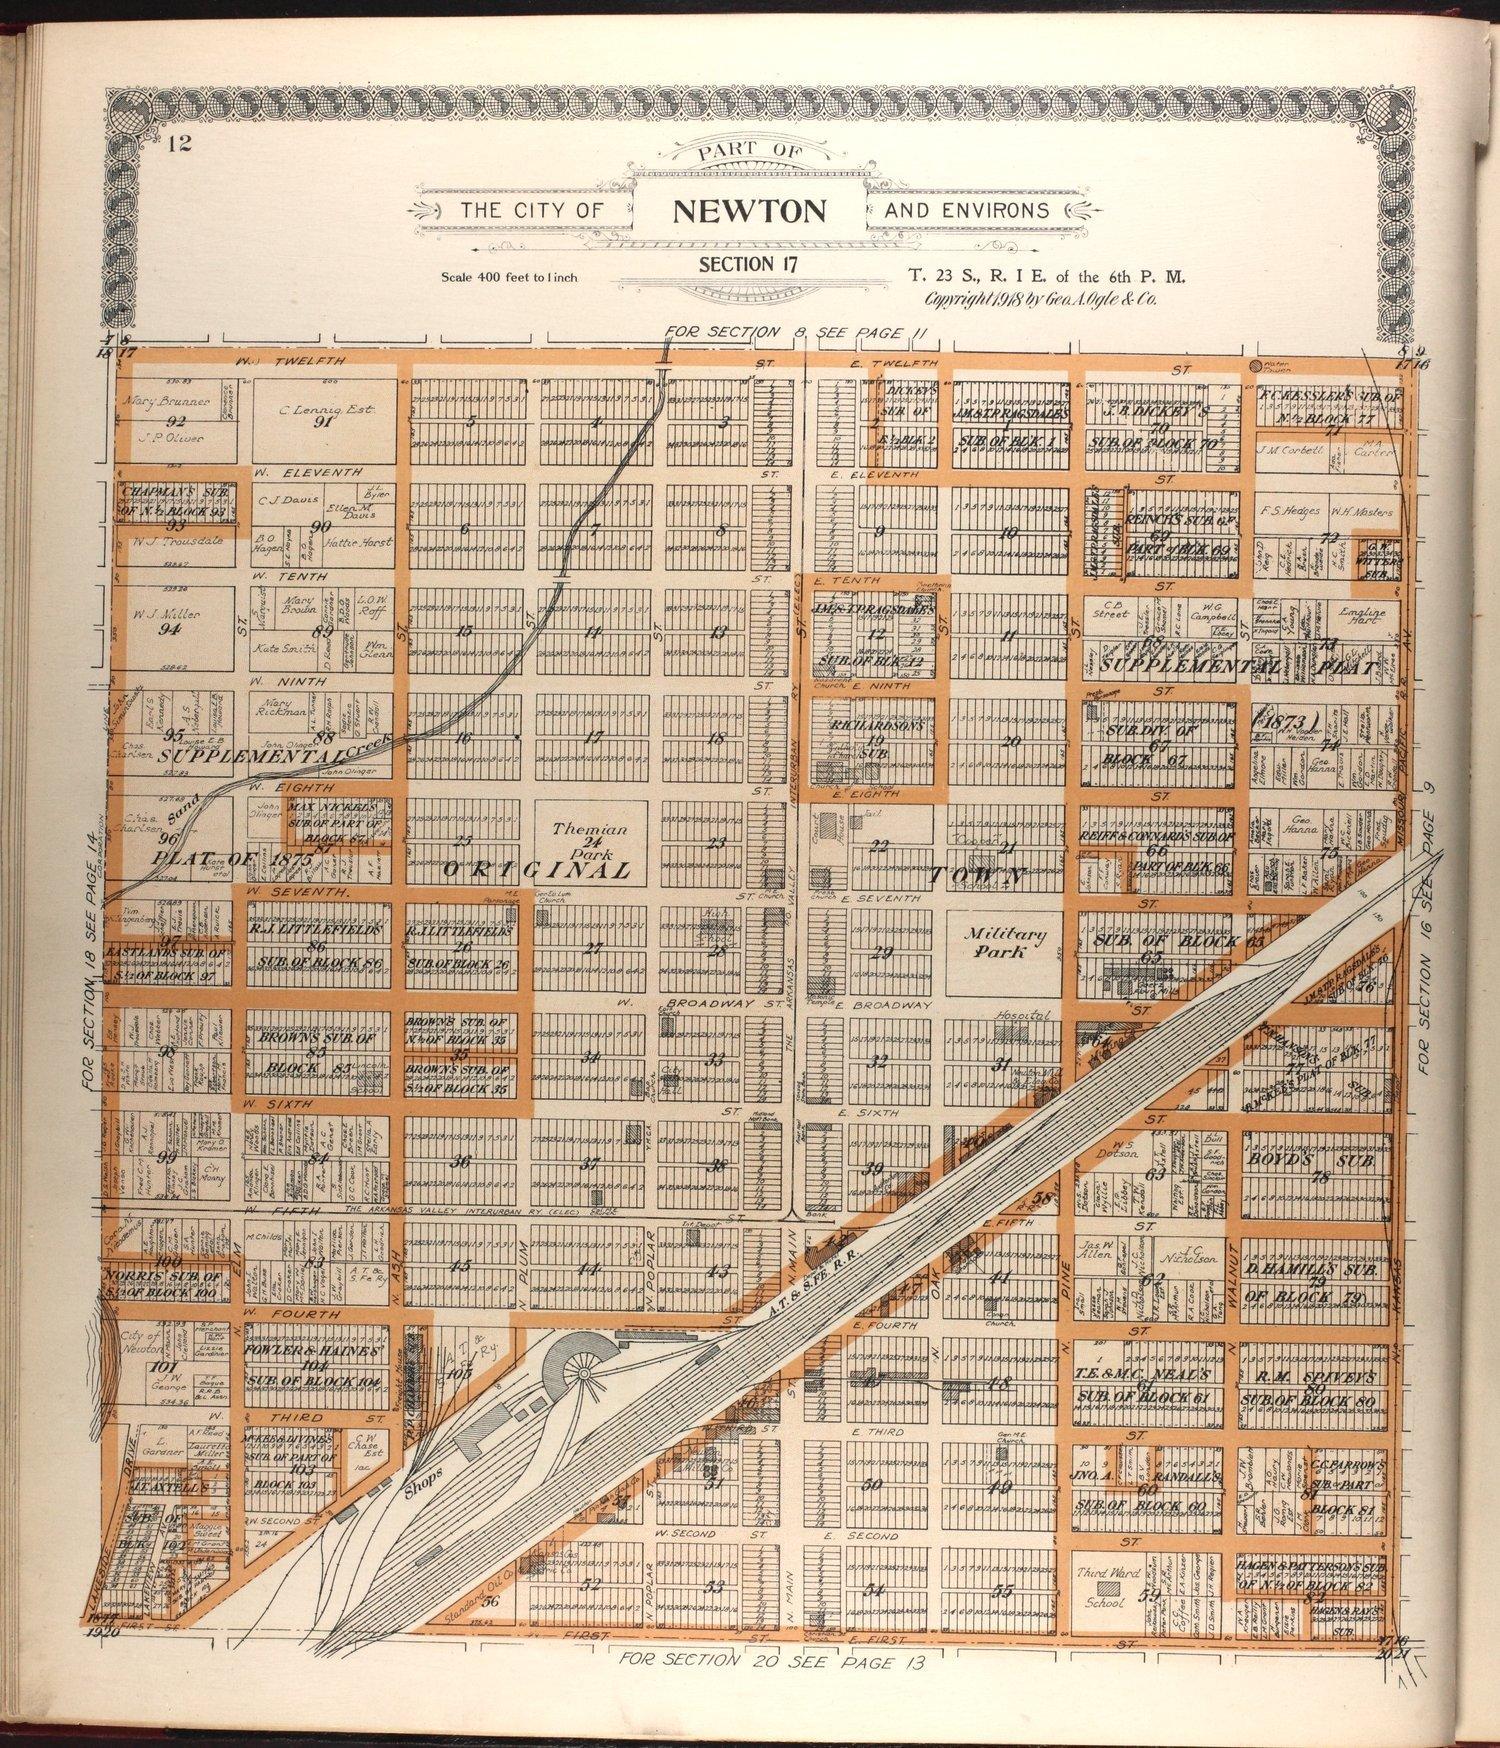 Standard atlas of Harvey County, Kansas - 12